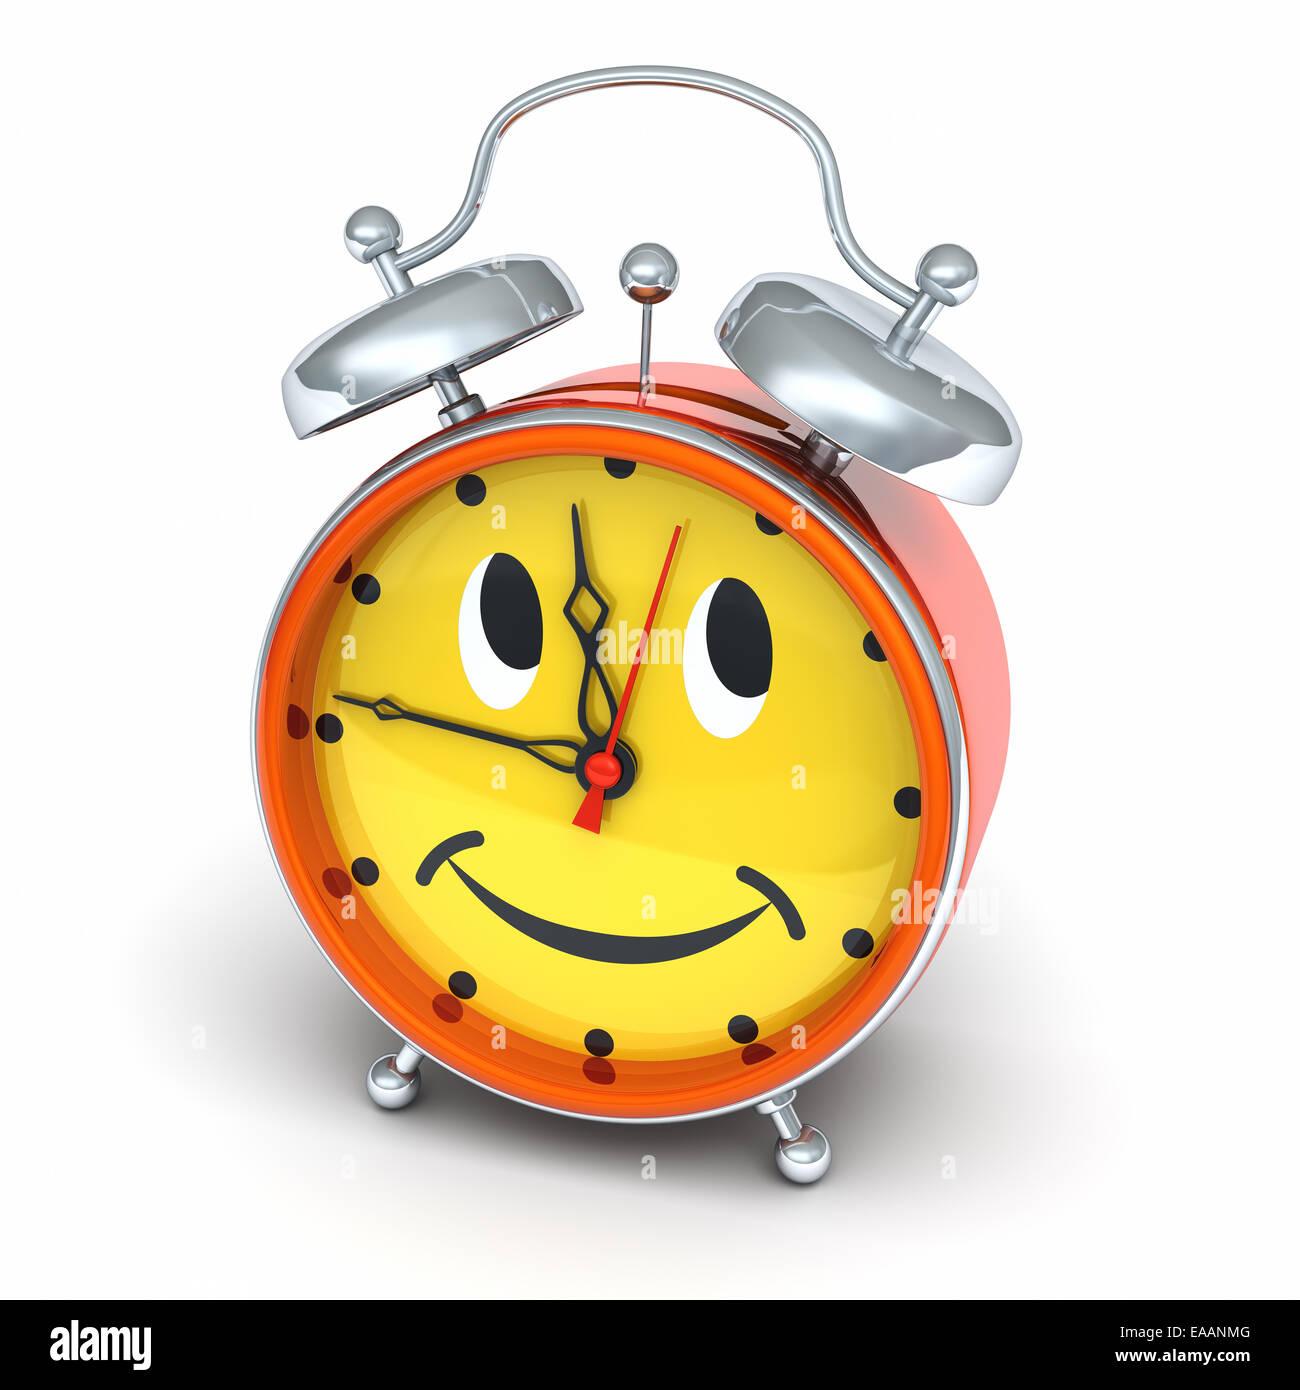 Wall Clock Smiley Smile with springs Diameter 25 cm Vintage